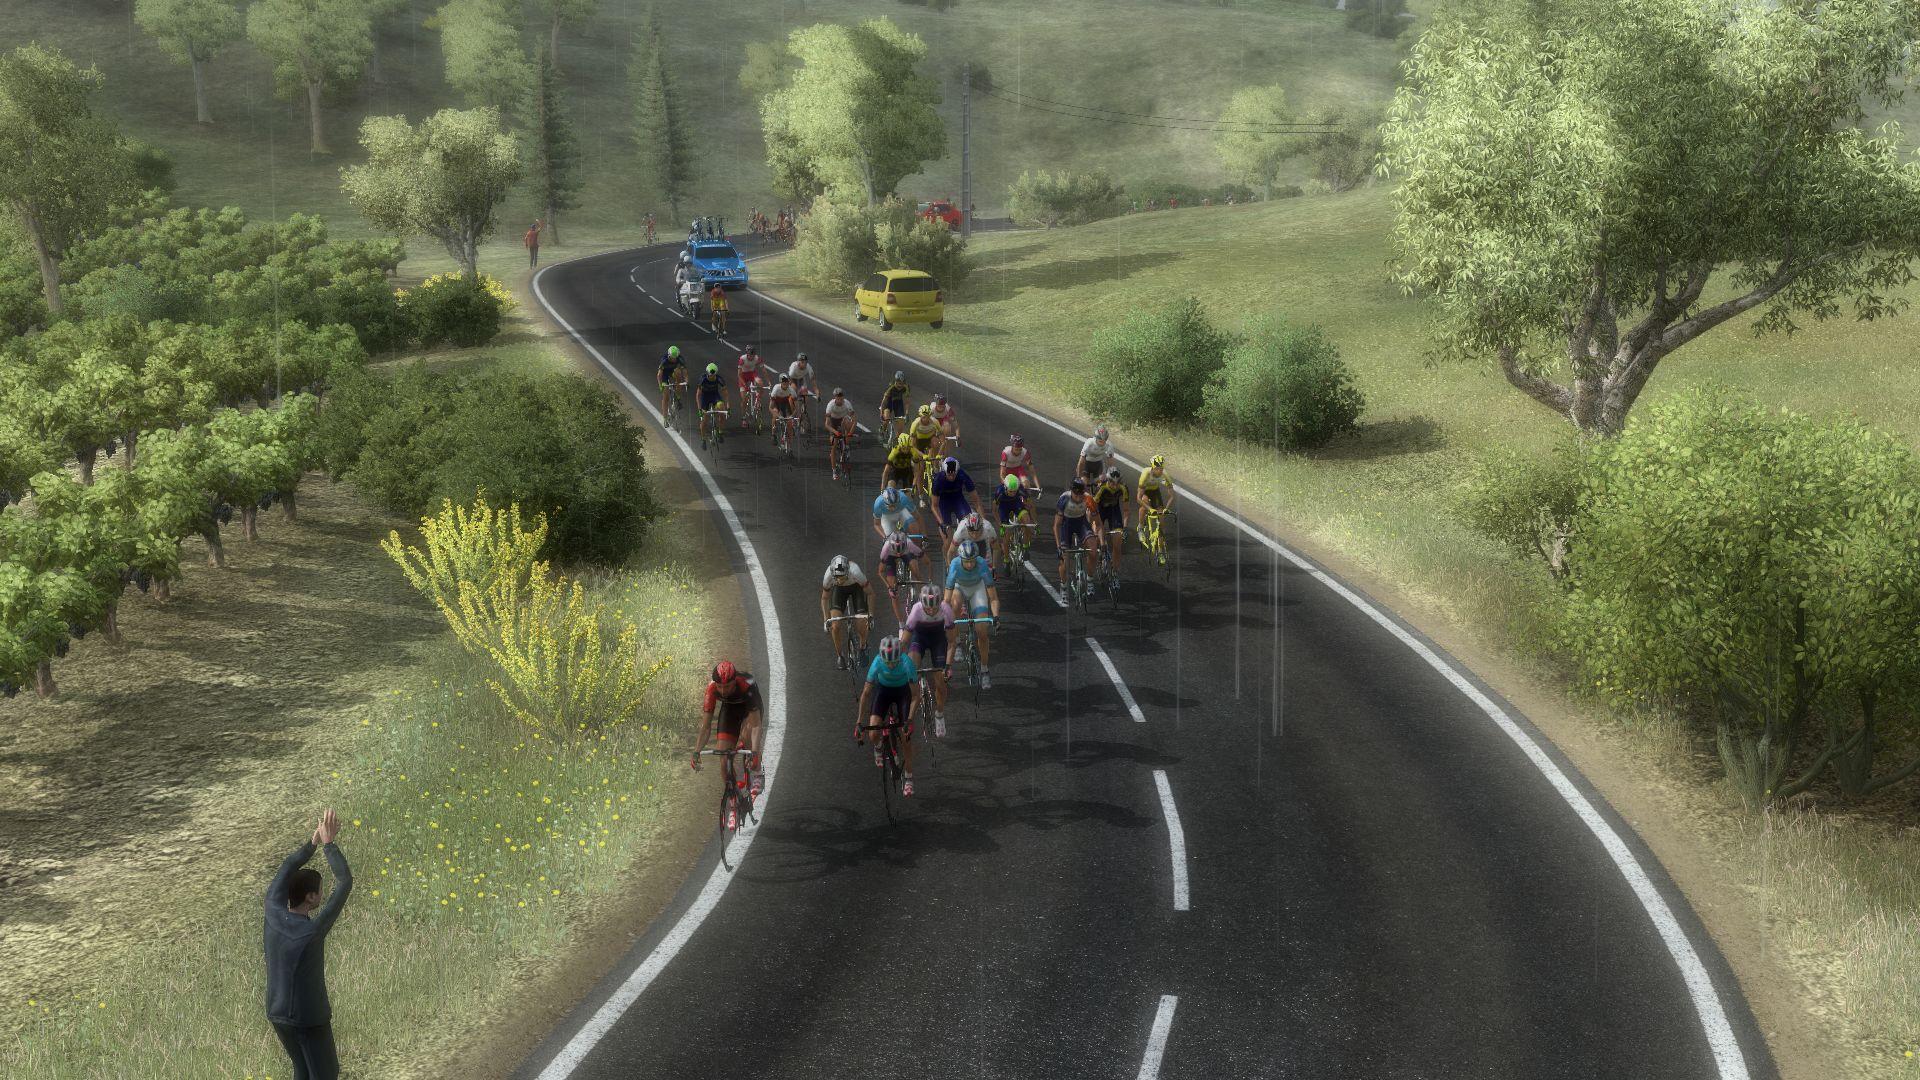 pcmdaily.com/images/mg/2020/Reports/GTM/Giro/S08/mg20_giro_s08_40.jpg